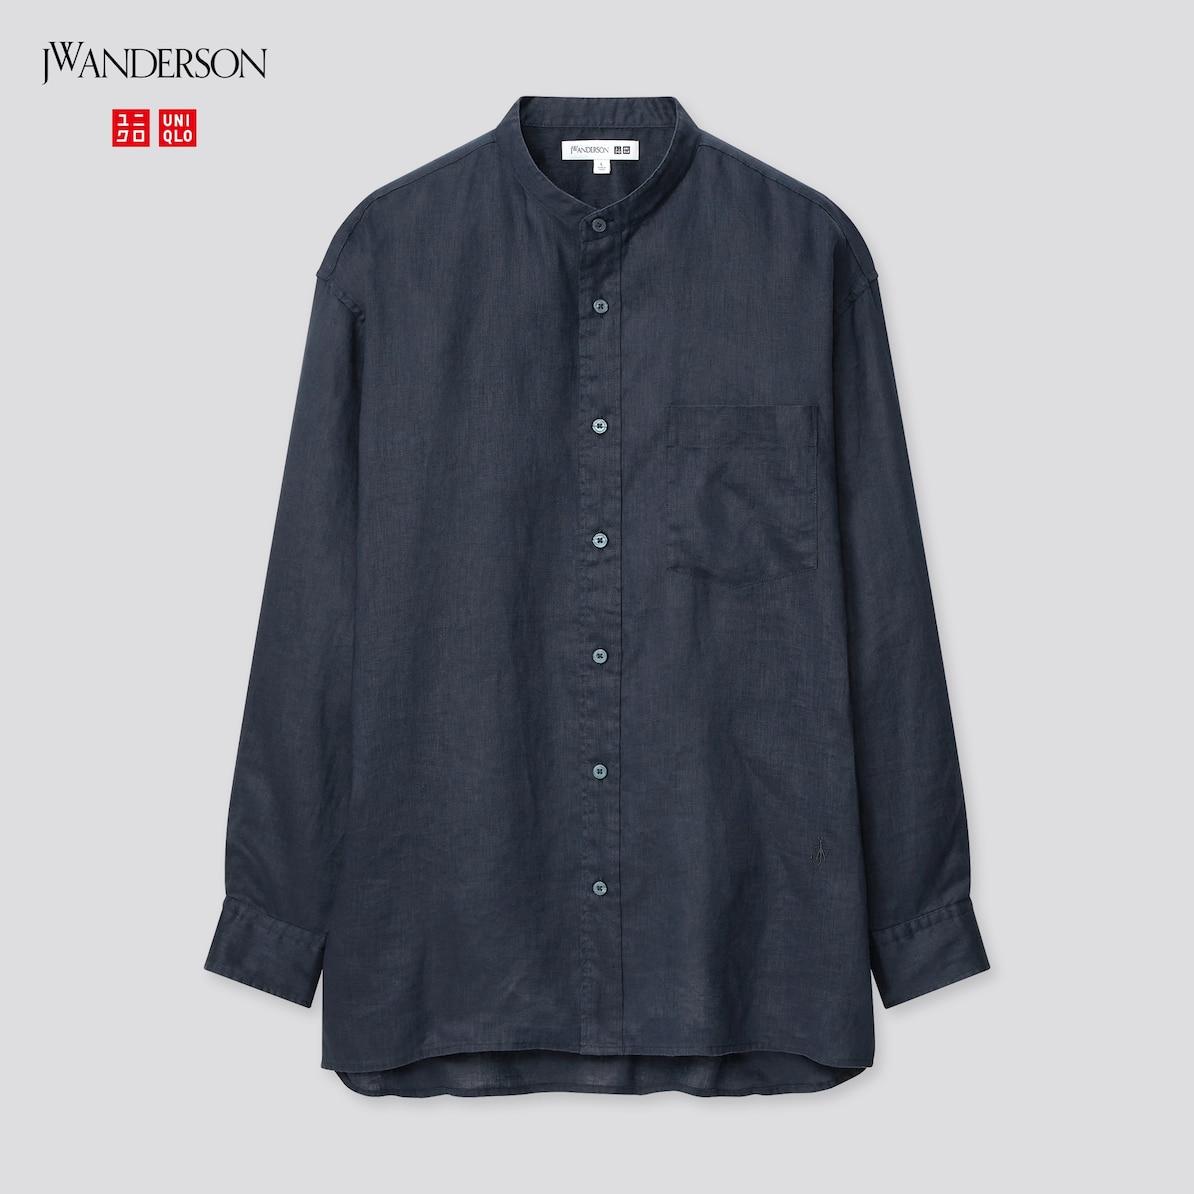 f:id:yamada0221:20210423131123j:plain